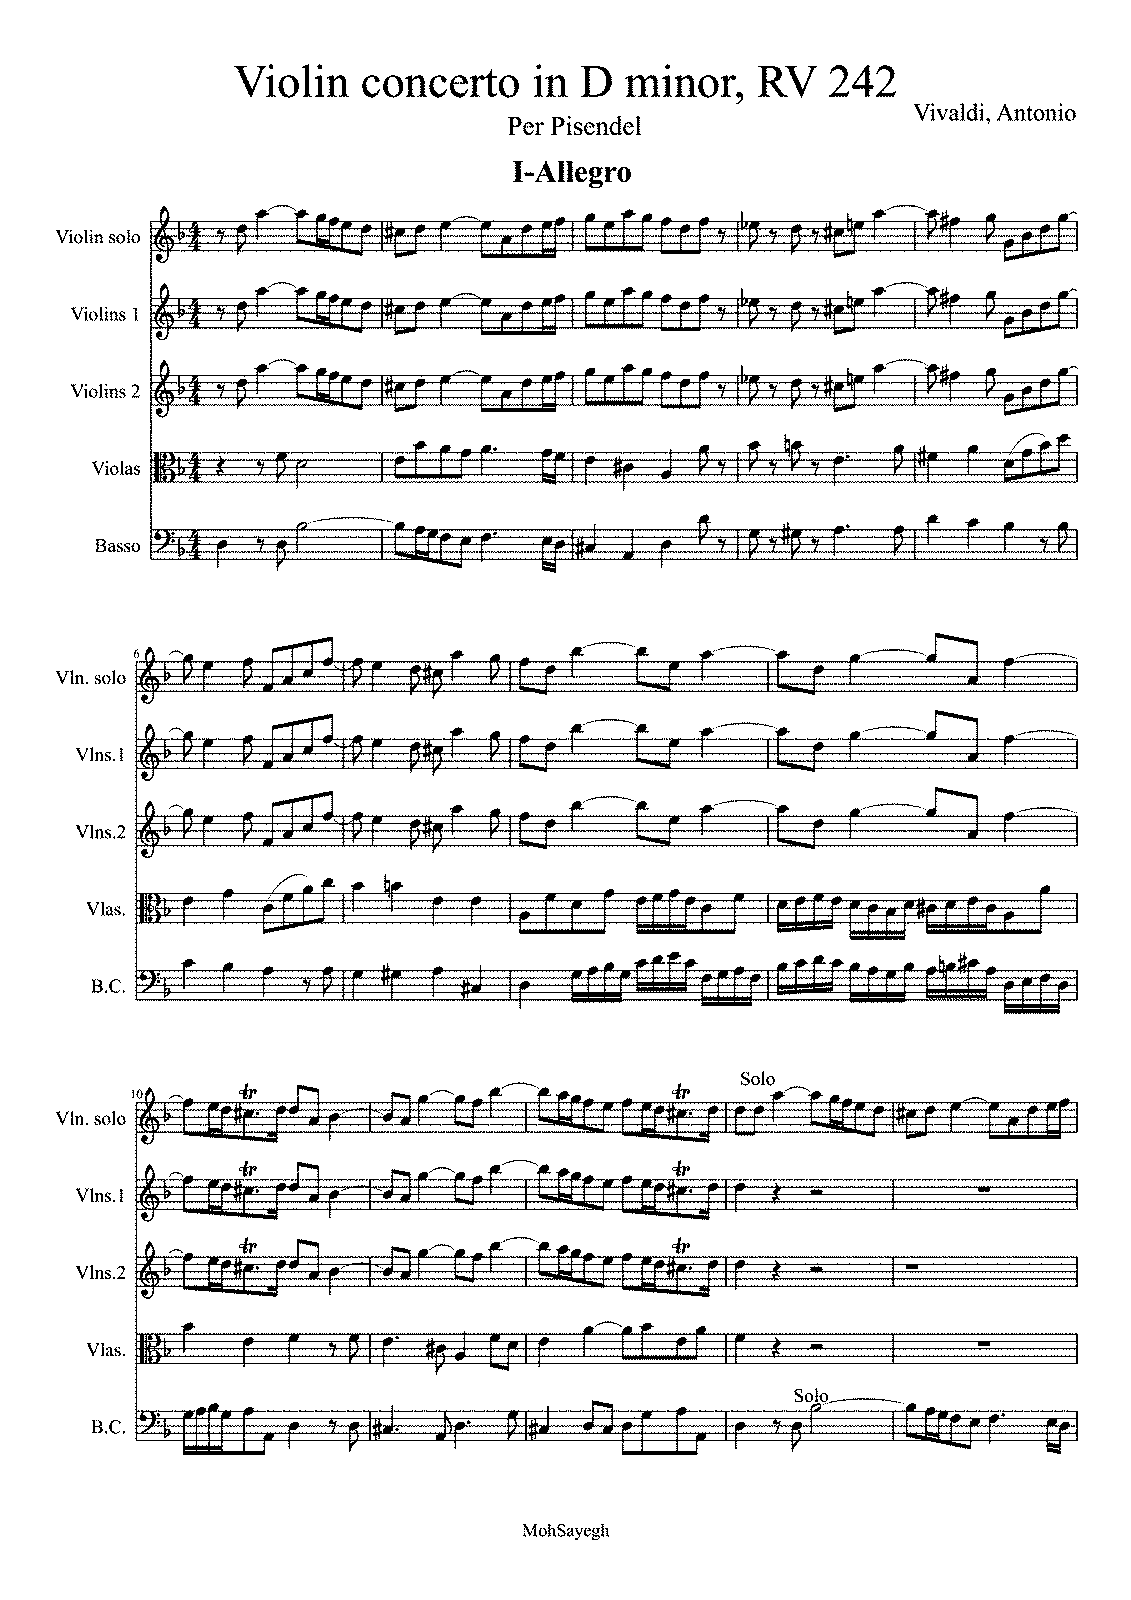 Violin Concerto in D minor, RV 242 (Vivaldi, Antonio